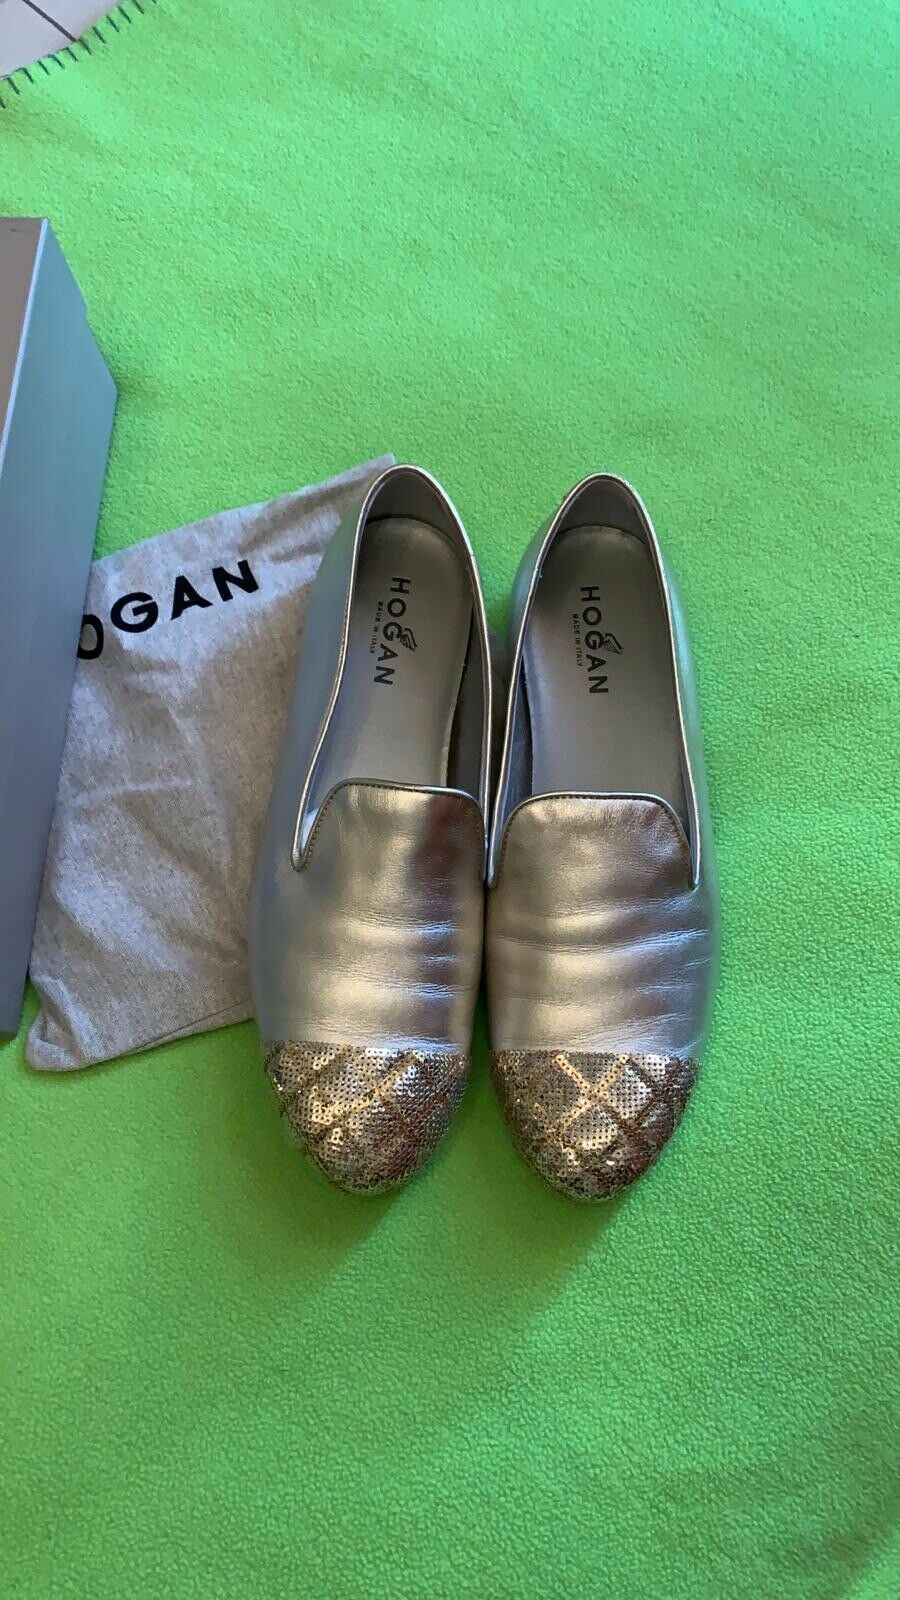 Hogan, plat argent mocassins. cuir, made in ITALY, taille 7.5 7.5 7.5 eu 40.5, Utilisé deca09